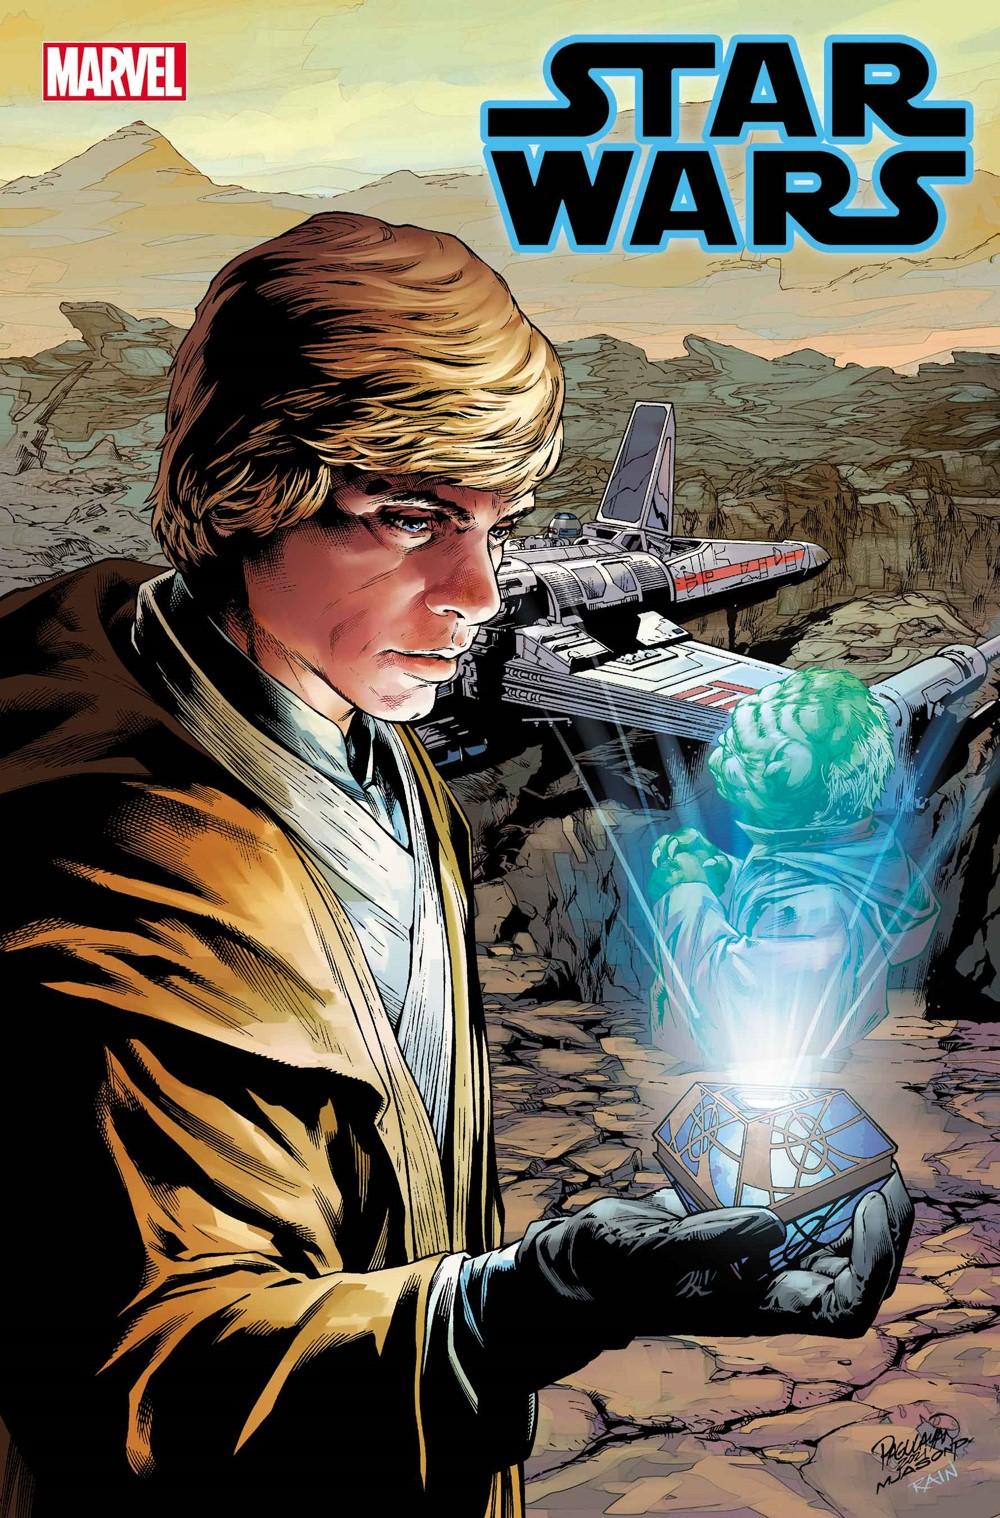 STWARS020COVER_COL Marvel Comics December 2021 Solicitations